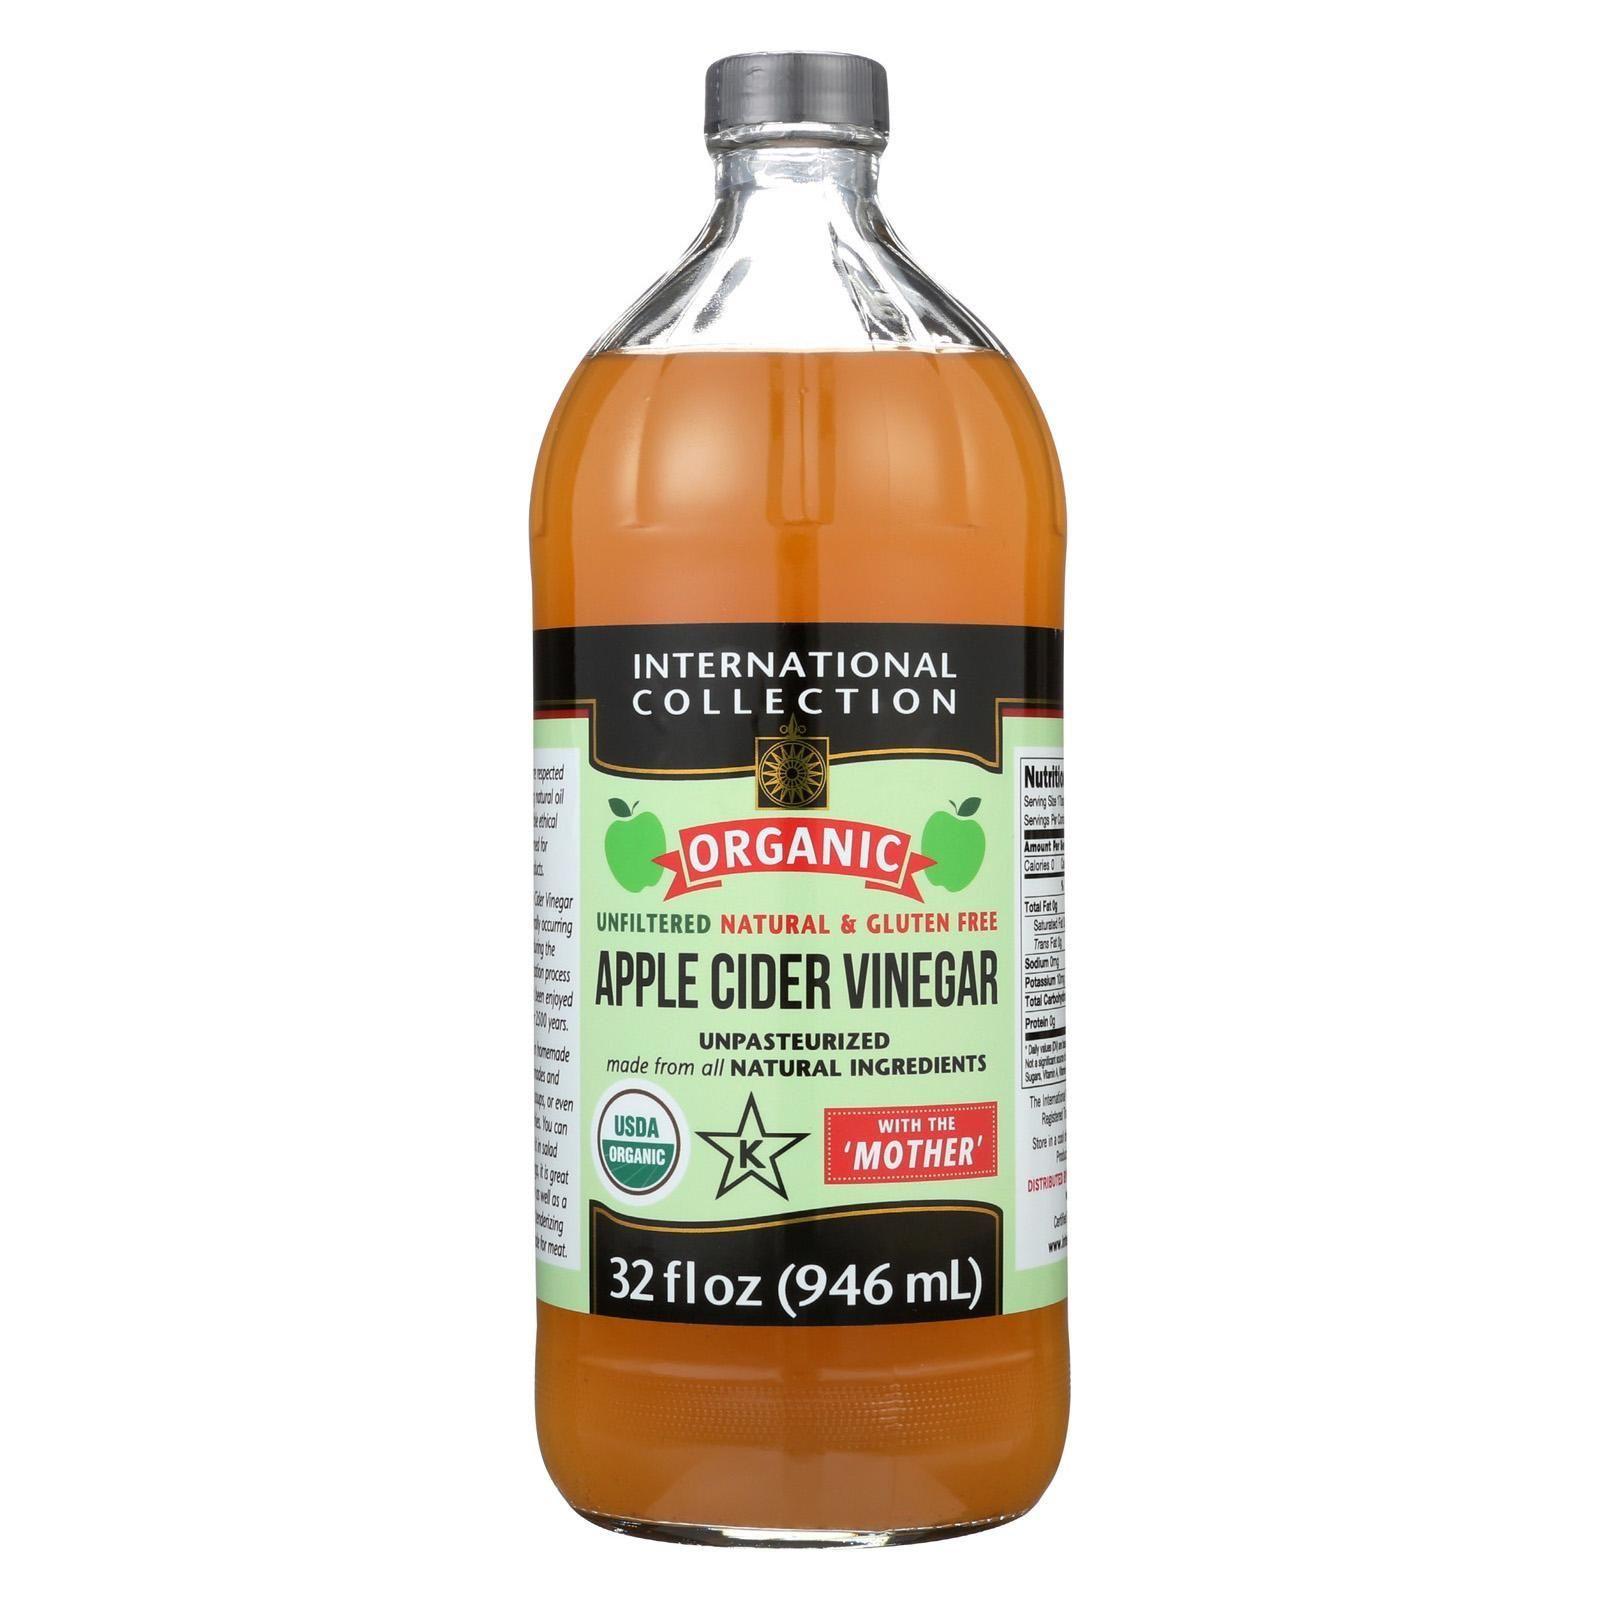 International Collection Vinegar Organic Apple Cider